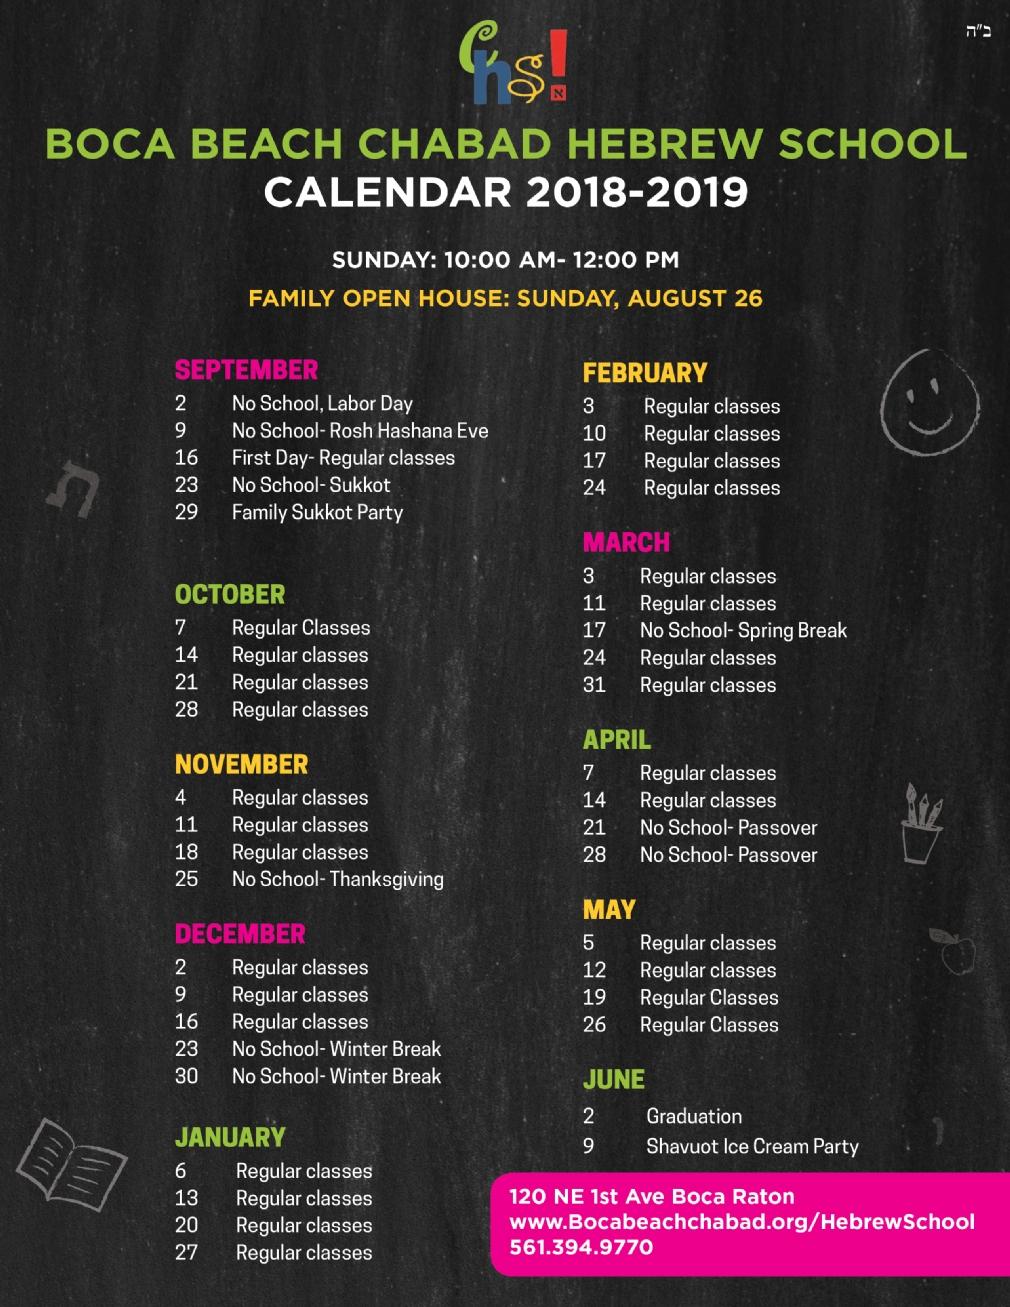 Hebrew school calendar 5779.jpg